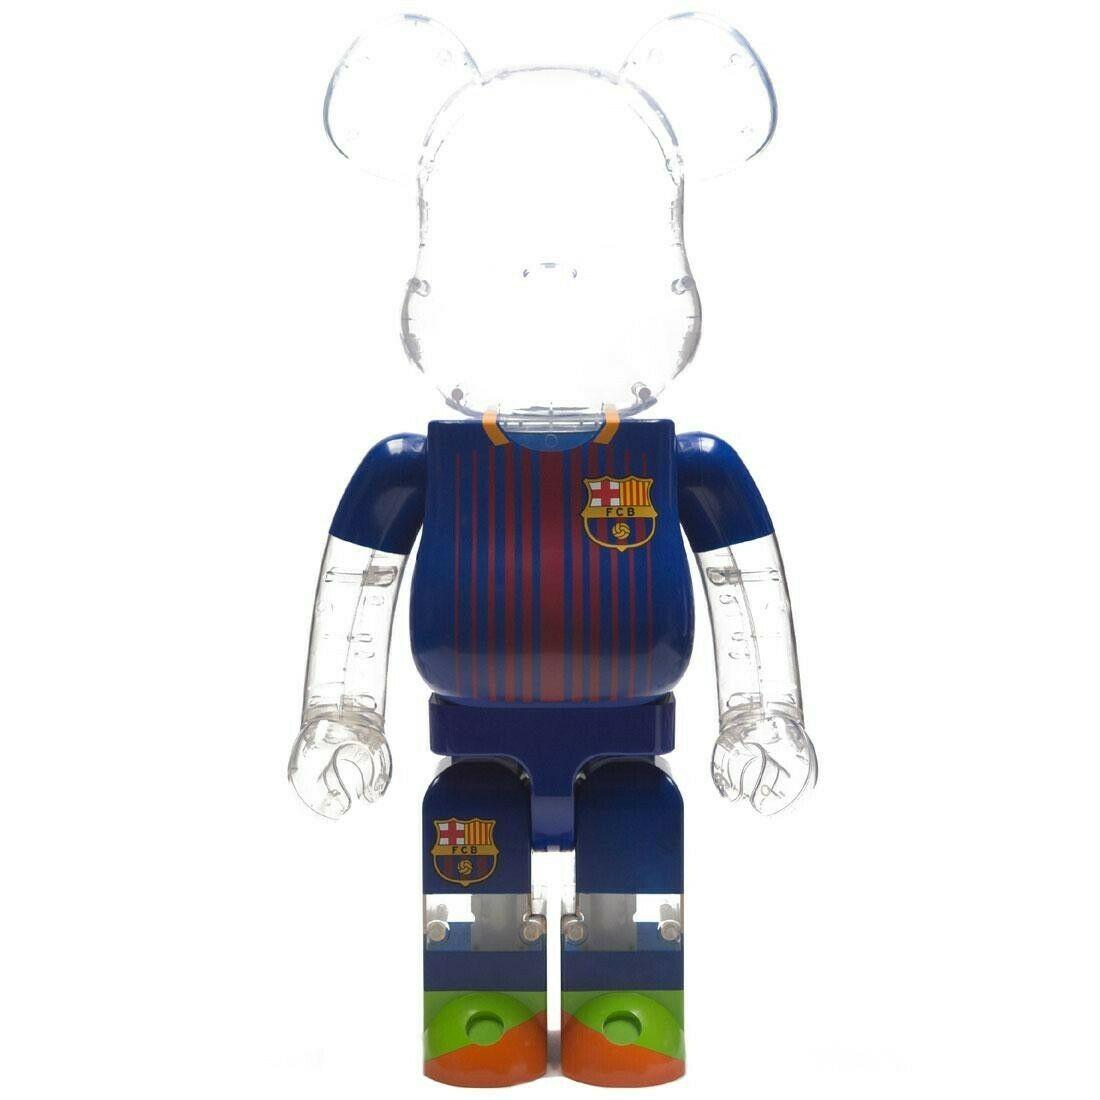 1fefba65 FC Barcelona Bearbrick 1000% Be@rbrick Medicom Toy Limited   Xclusive AF